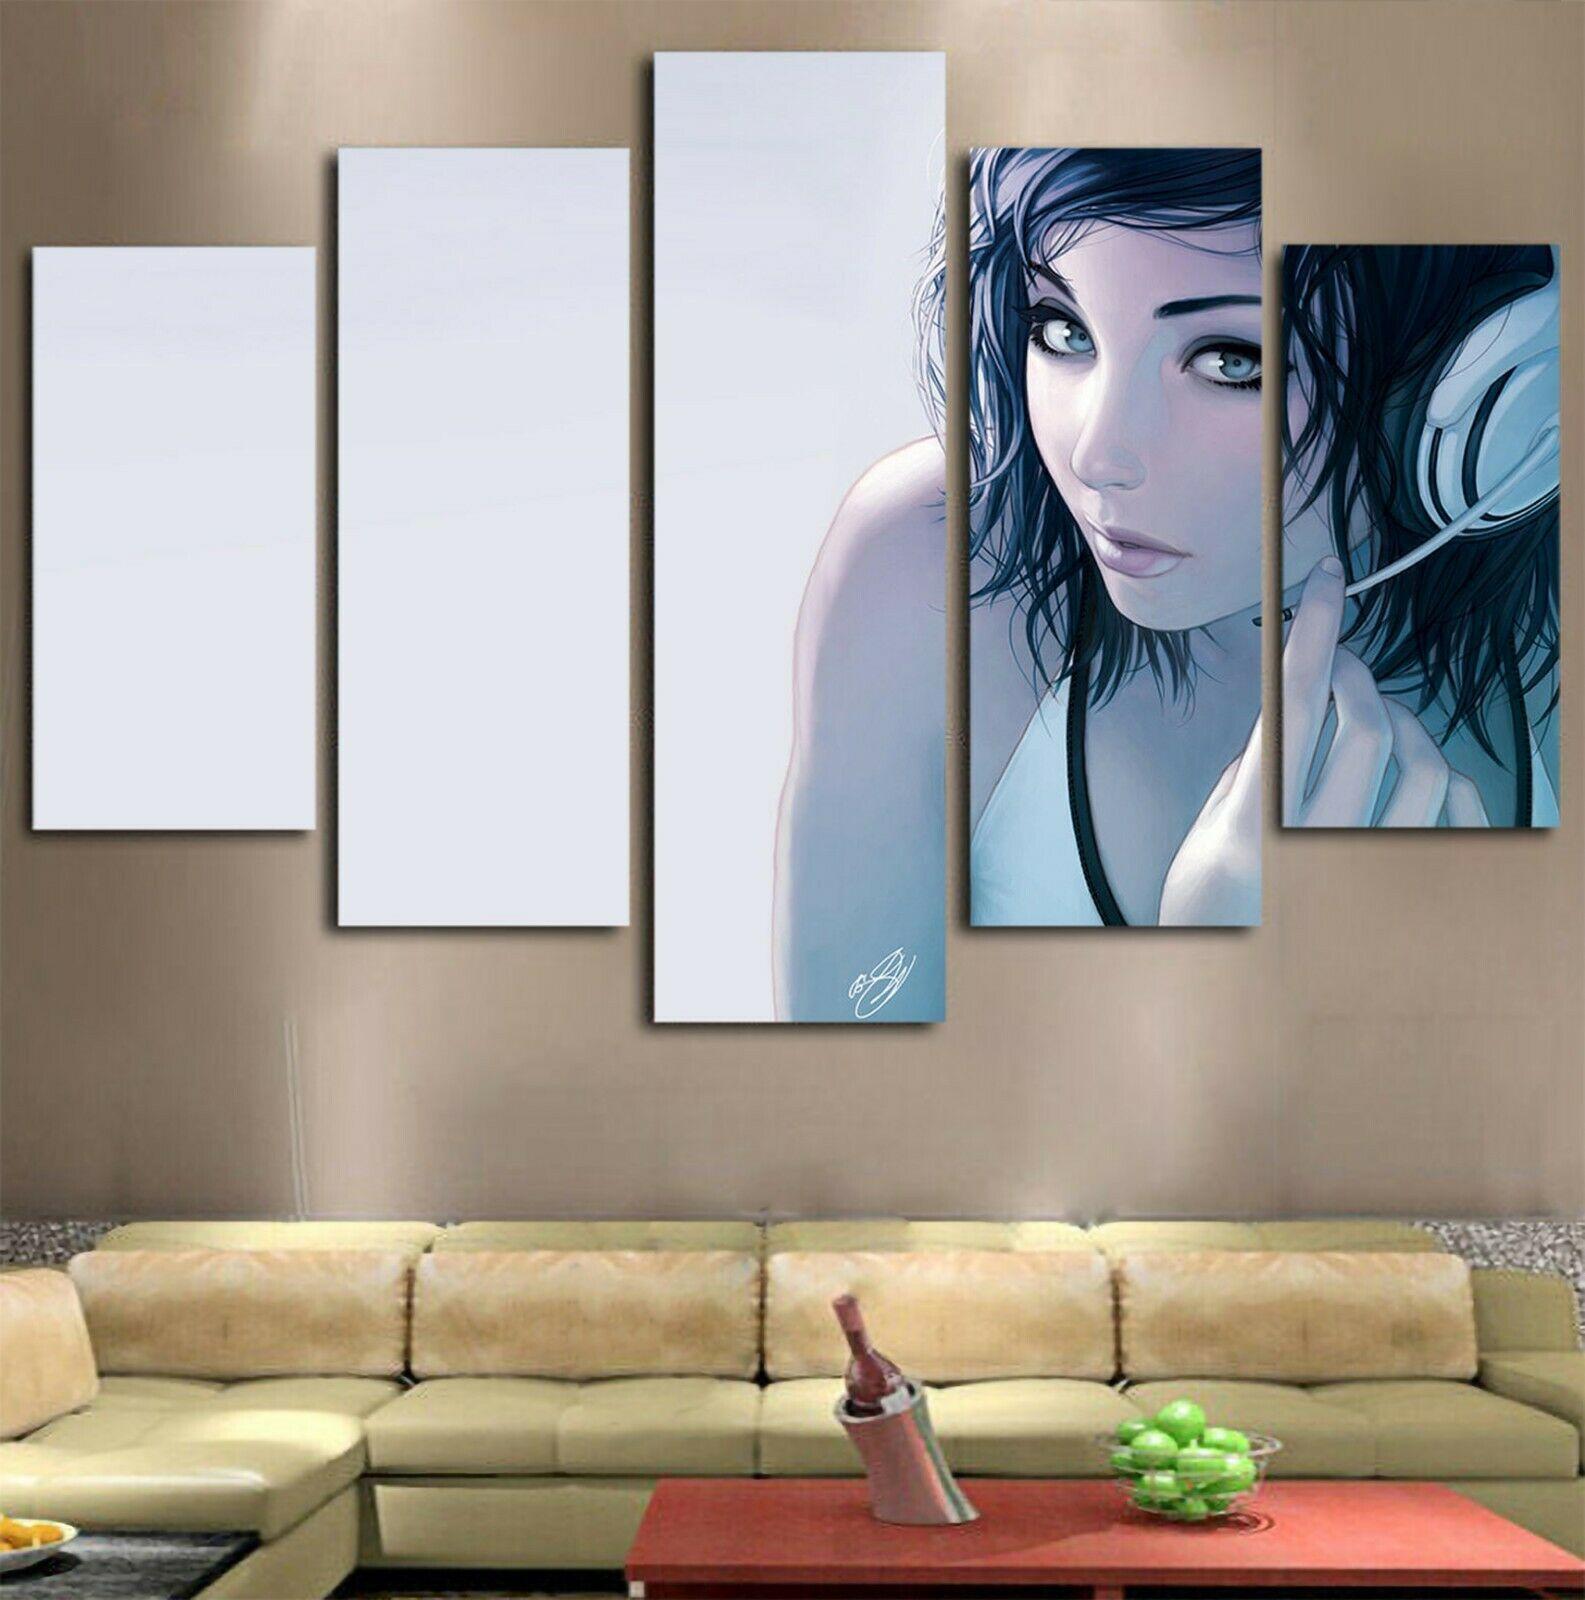 Hot Anime Gamer Girl Drawing Modern Art Canvas Wall Art Home Decor Framed 5pcs Ebay Modern Canvas Art Modern Art Pictures Canvas Wall Art